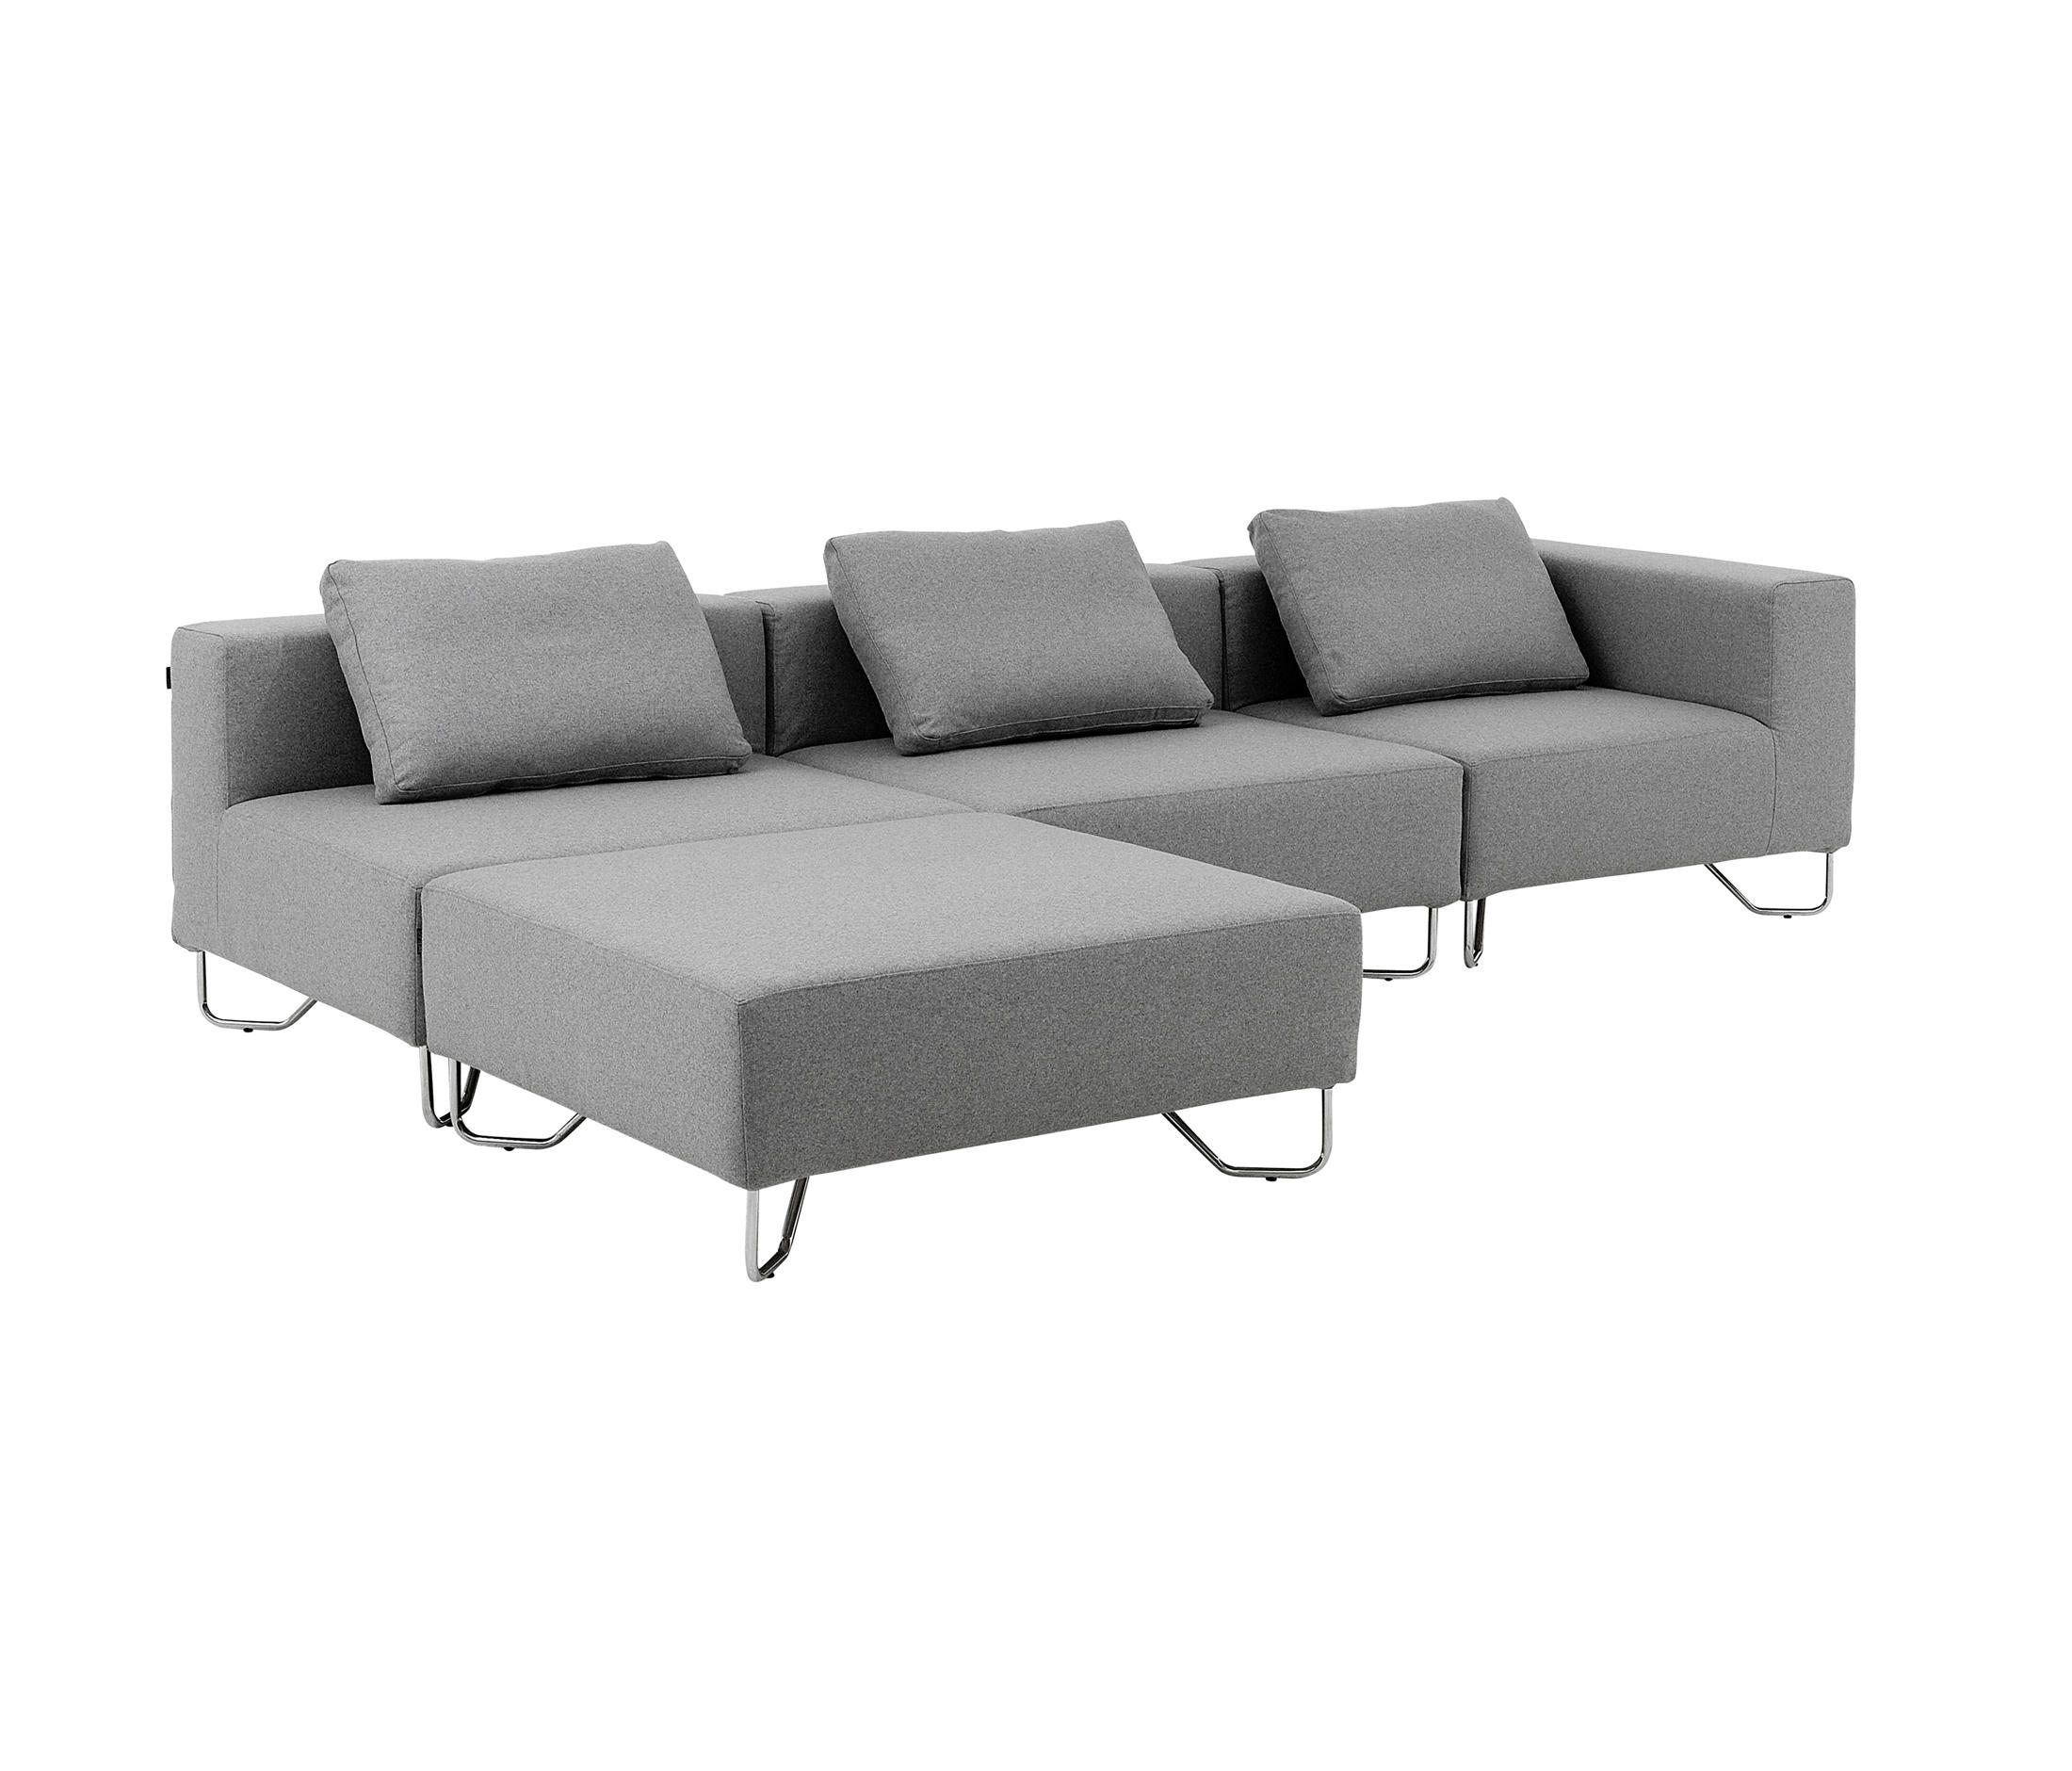 LOTUS SOFA - Modulare Sitzgruppen von Softline A/S   Architonic